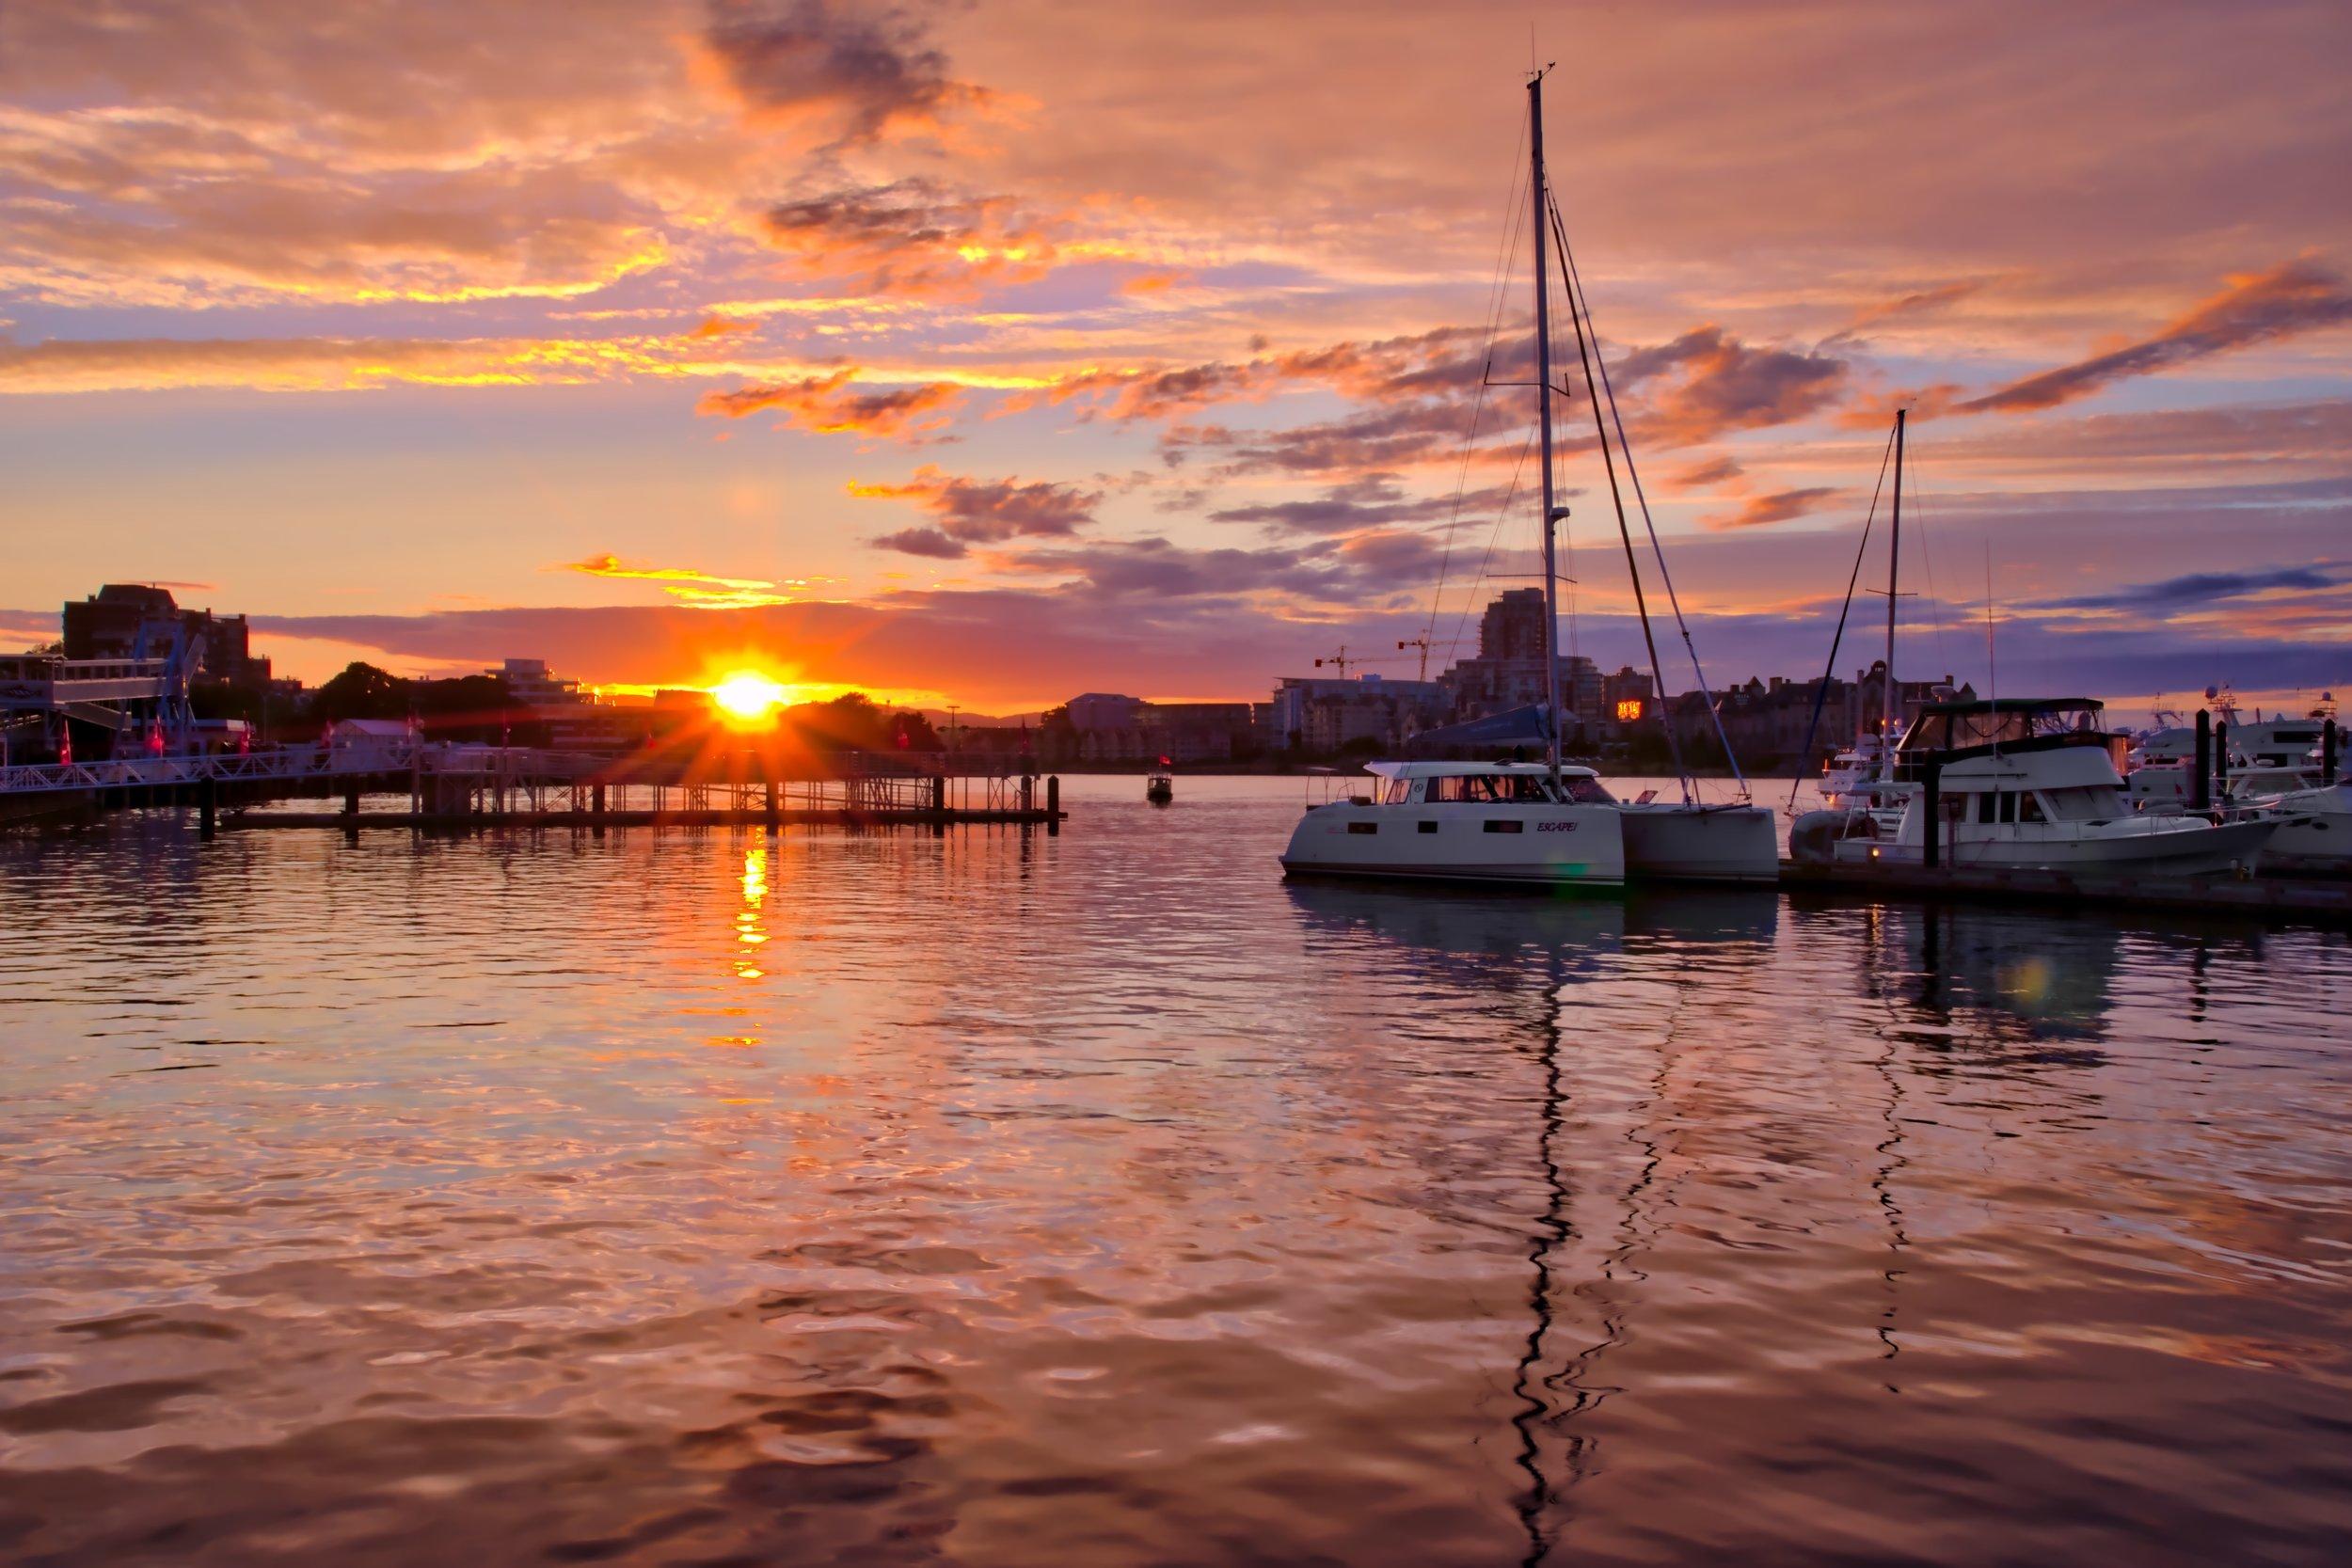 Canada-Victoria-harbor-sunset-HDR1.jpeg